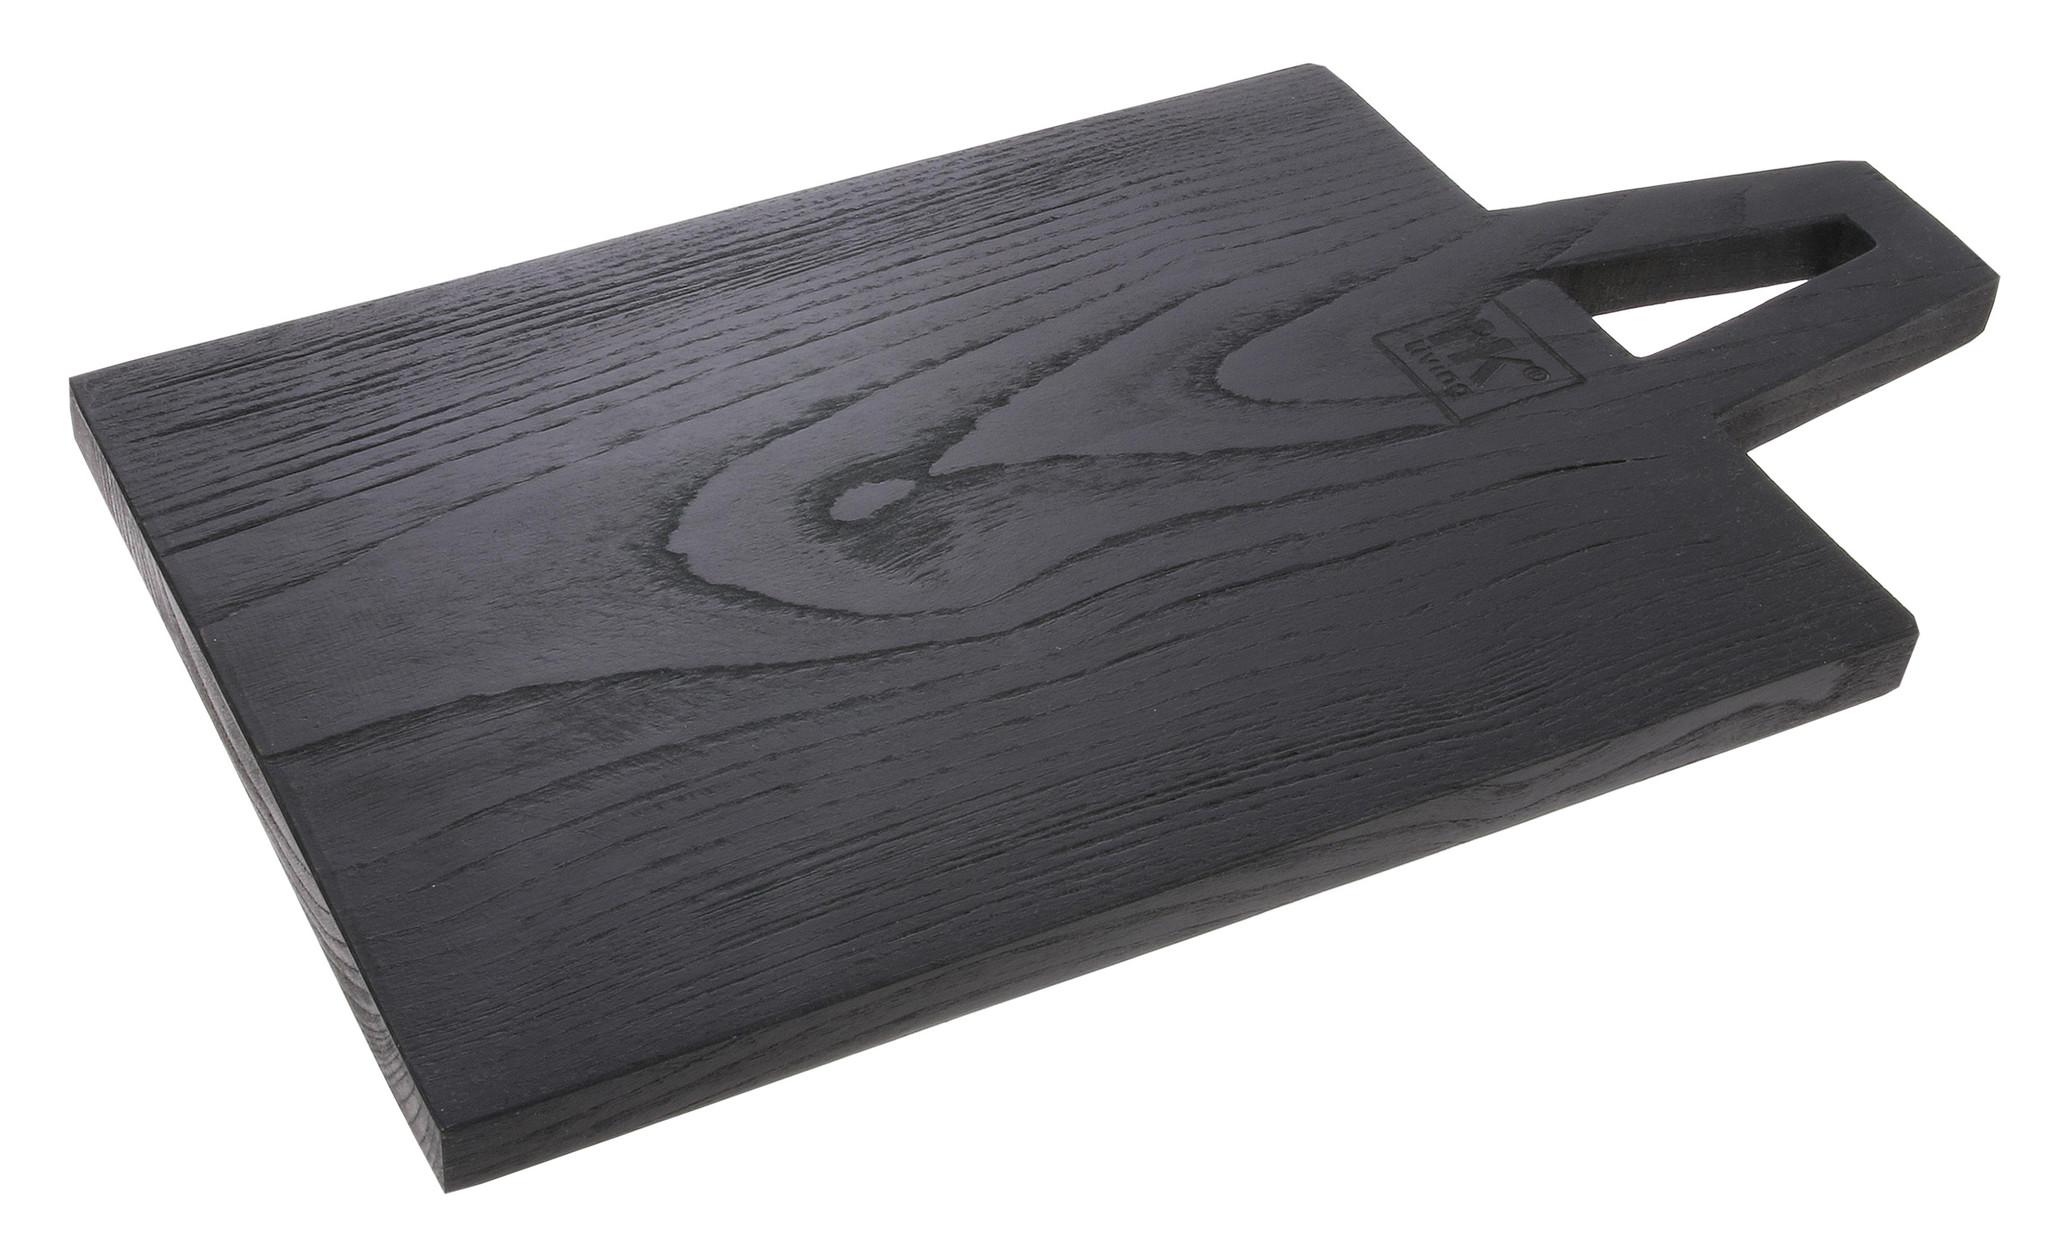 Broodplank Square S 30x17cm Black-3